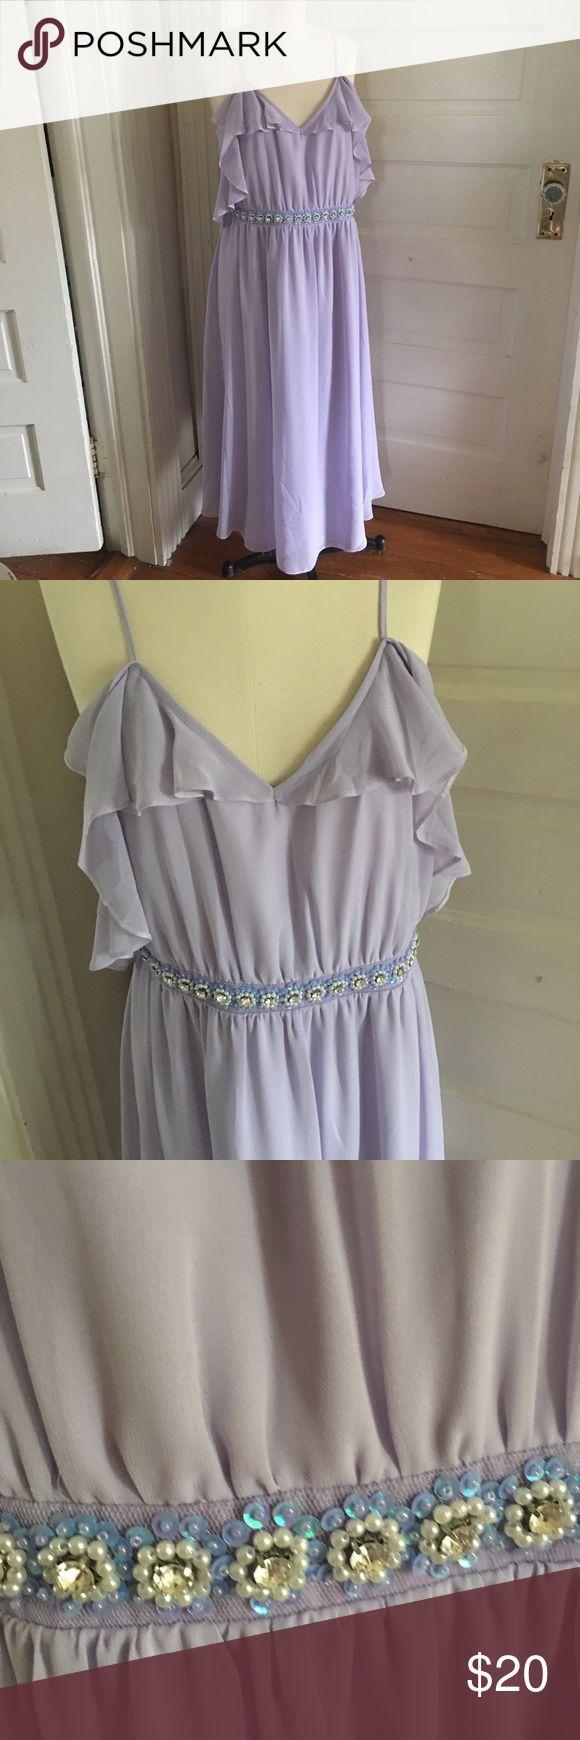 ASOS Lilac Lavender Purple Maternity Dress L/XL ASOS NWT great spring dress for Maternity. Size 16 ASOS Maternity Dresses